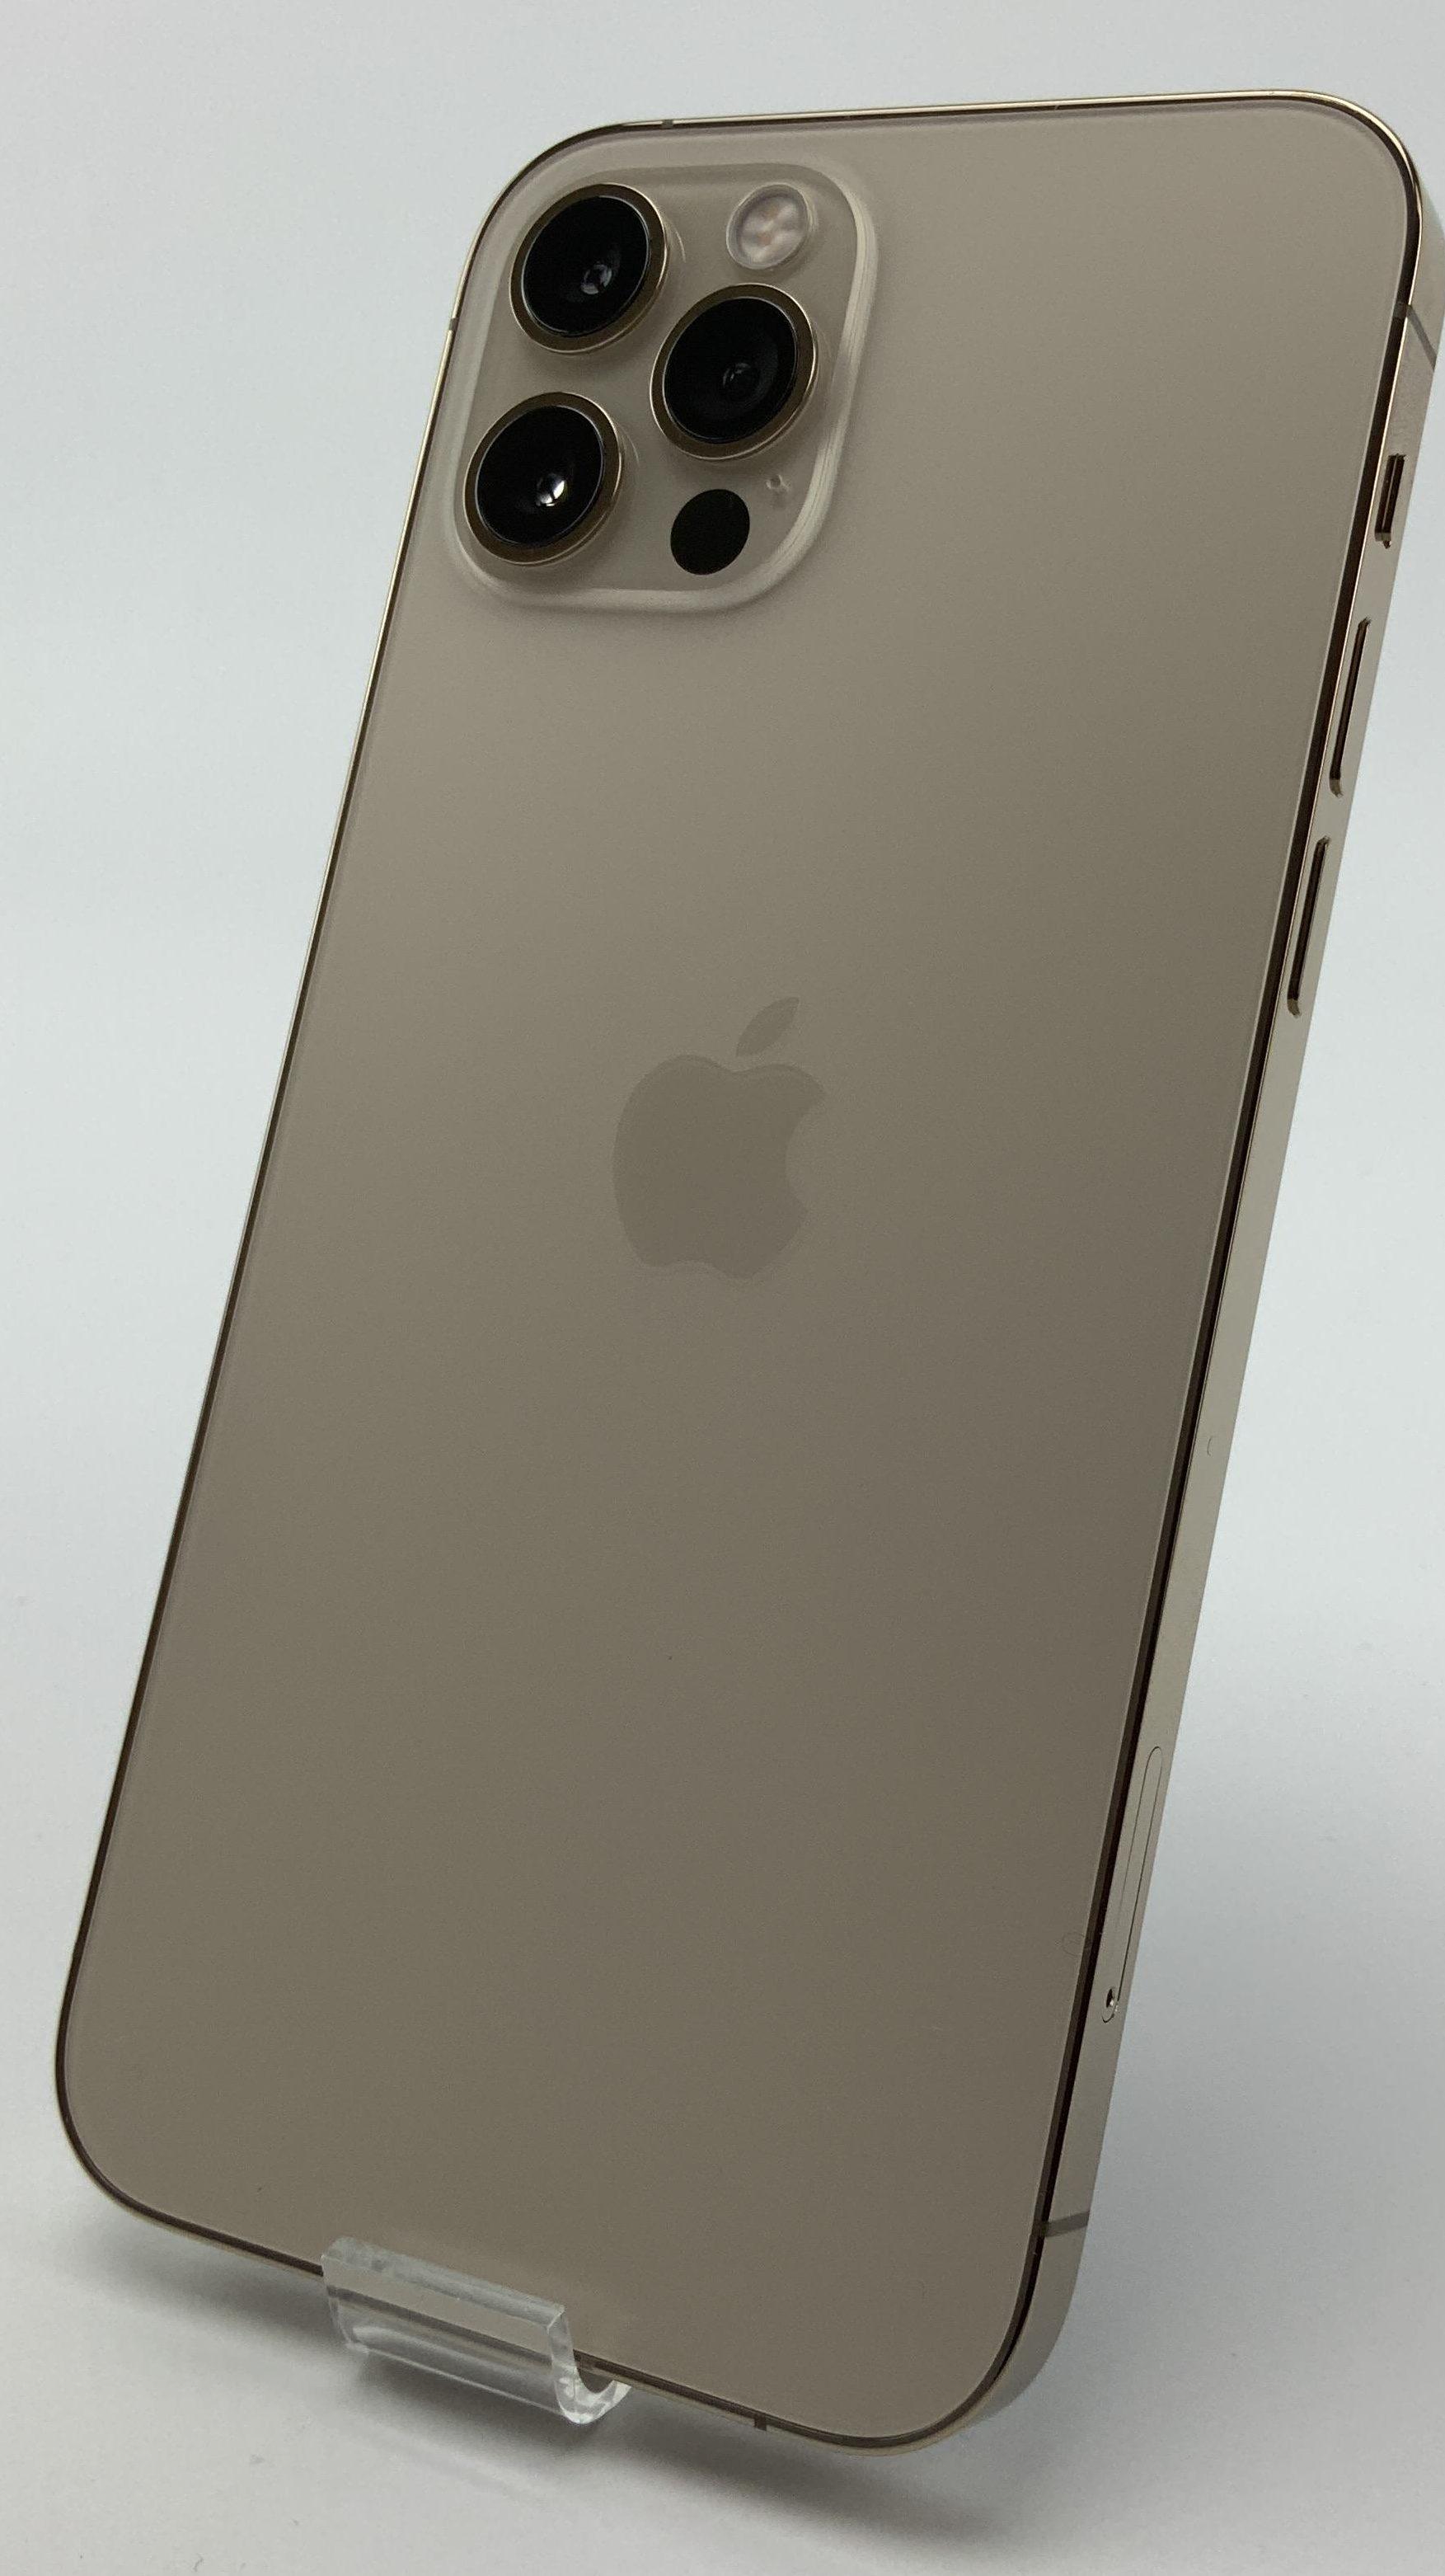 iPhone 12 Pro 256GB, 256GB, Gold, image 2